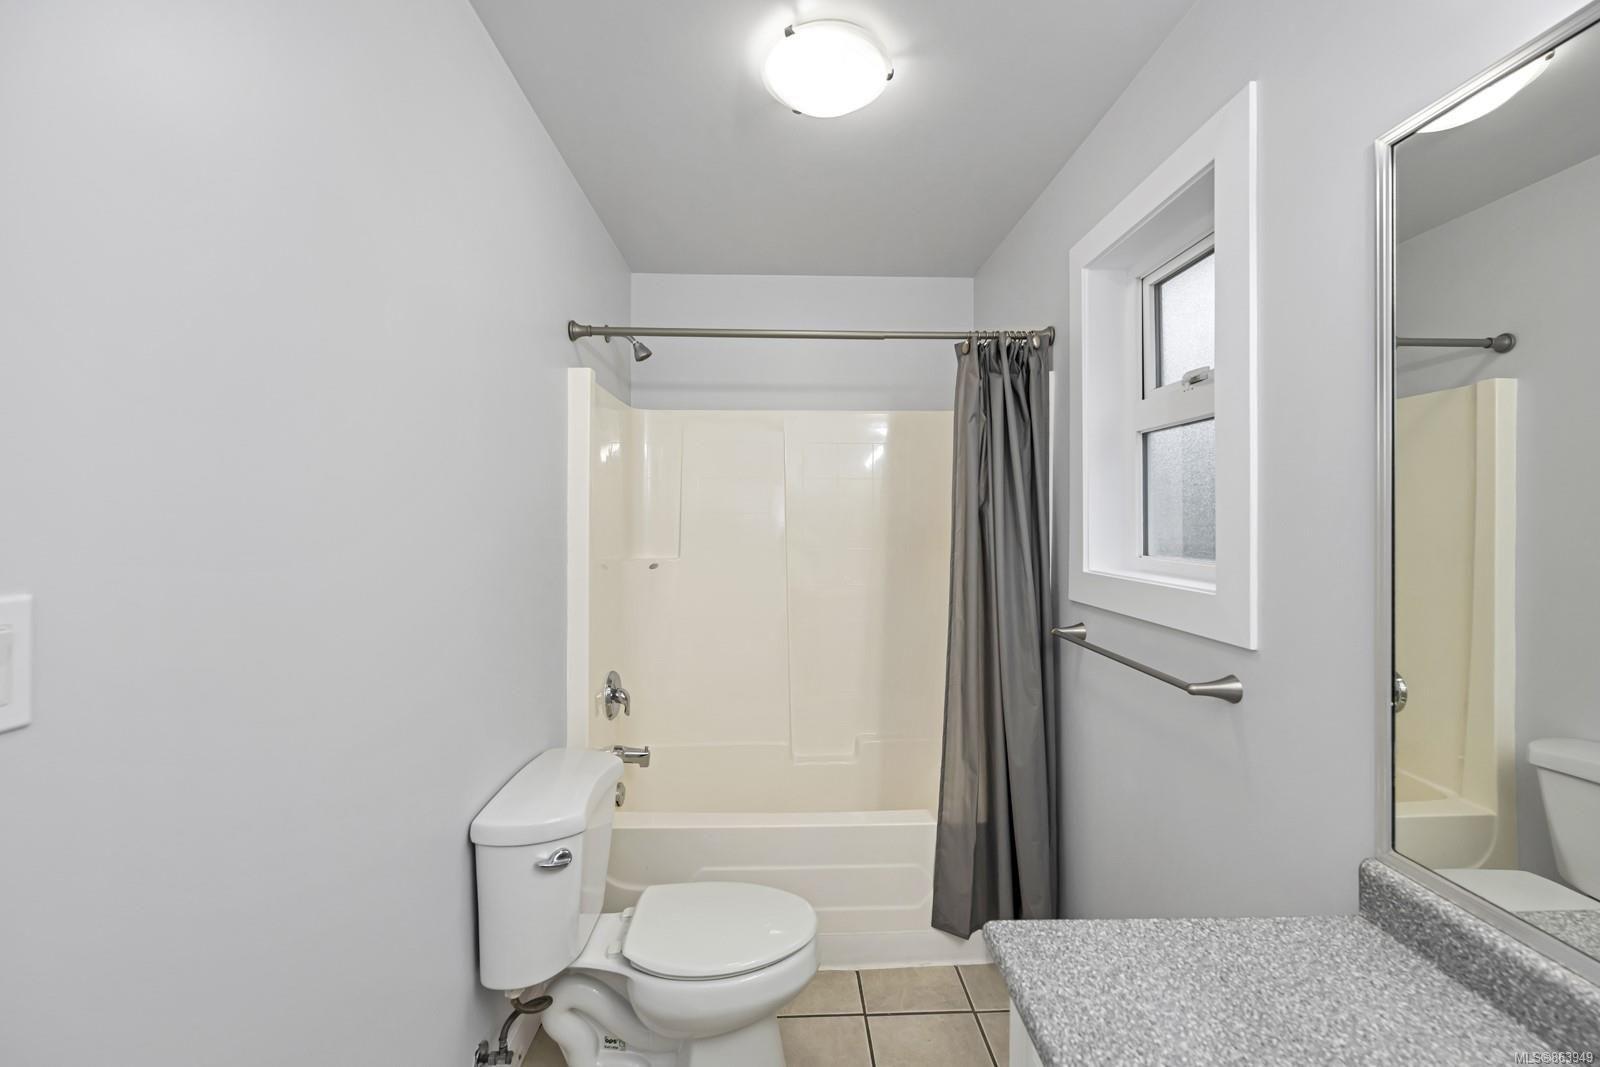 Photo 20: Photos: 6154 Sayward Rd in : Du West Duncan Half Duplex for sale (Duncan)  : MLS®# 863949